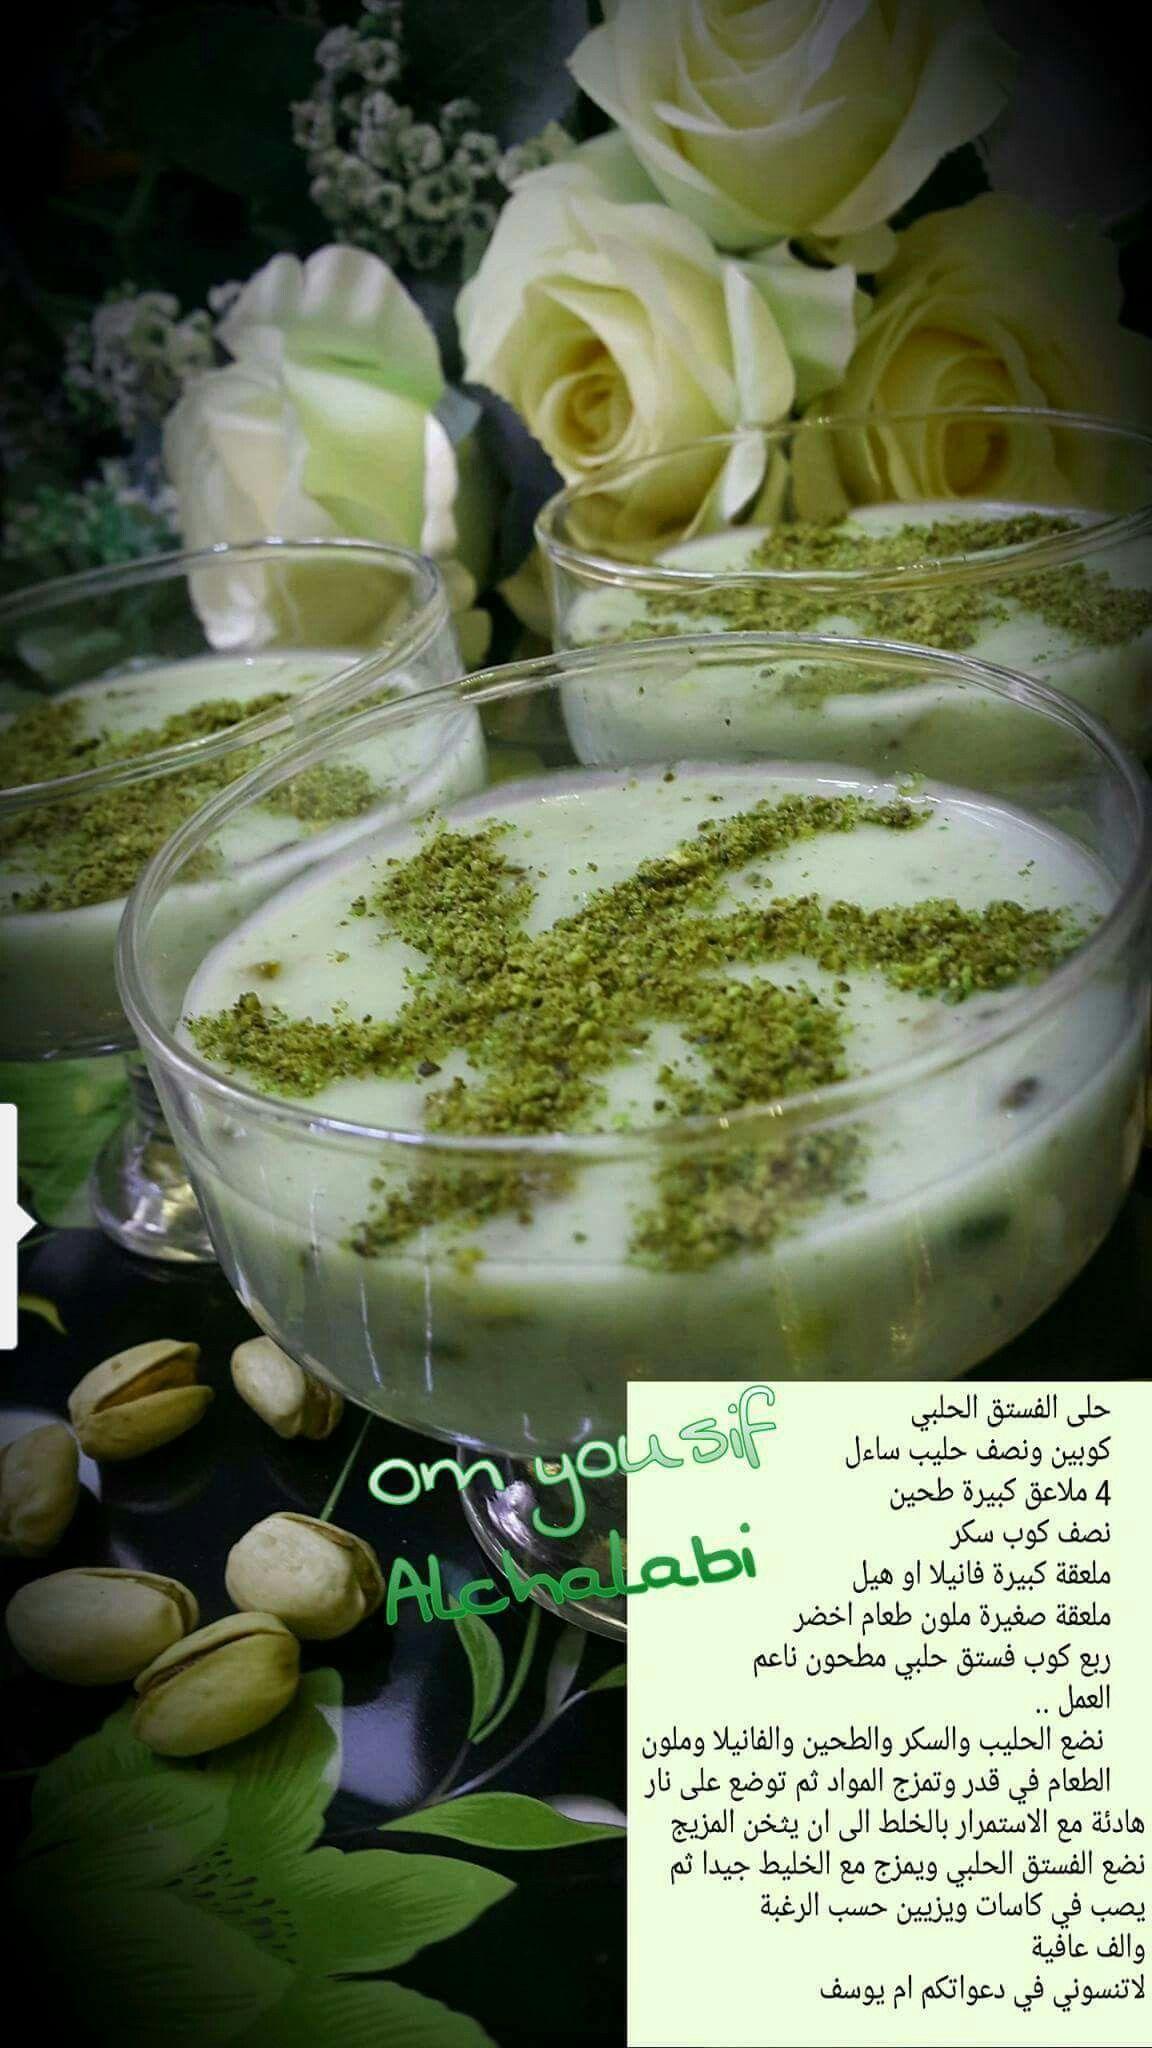 Pin By R Al Taii On اكلات وحلويات ومقبلات عراقيه منقوله Arabic Dessert Food And Drink Arabic Food